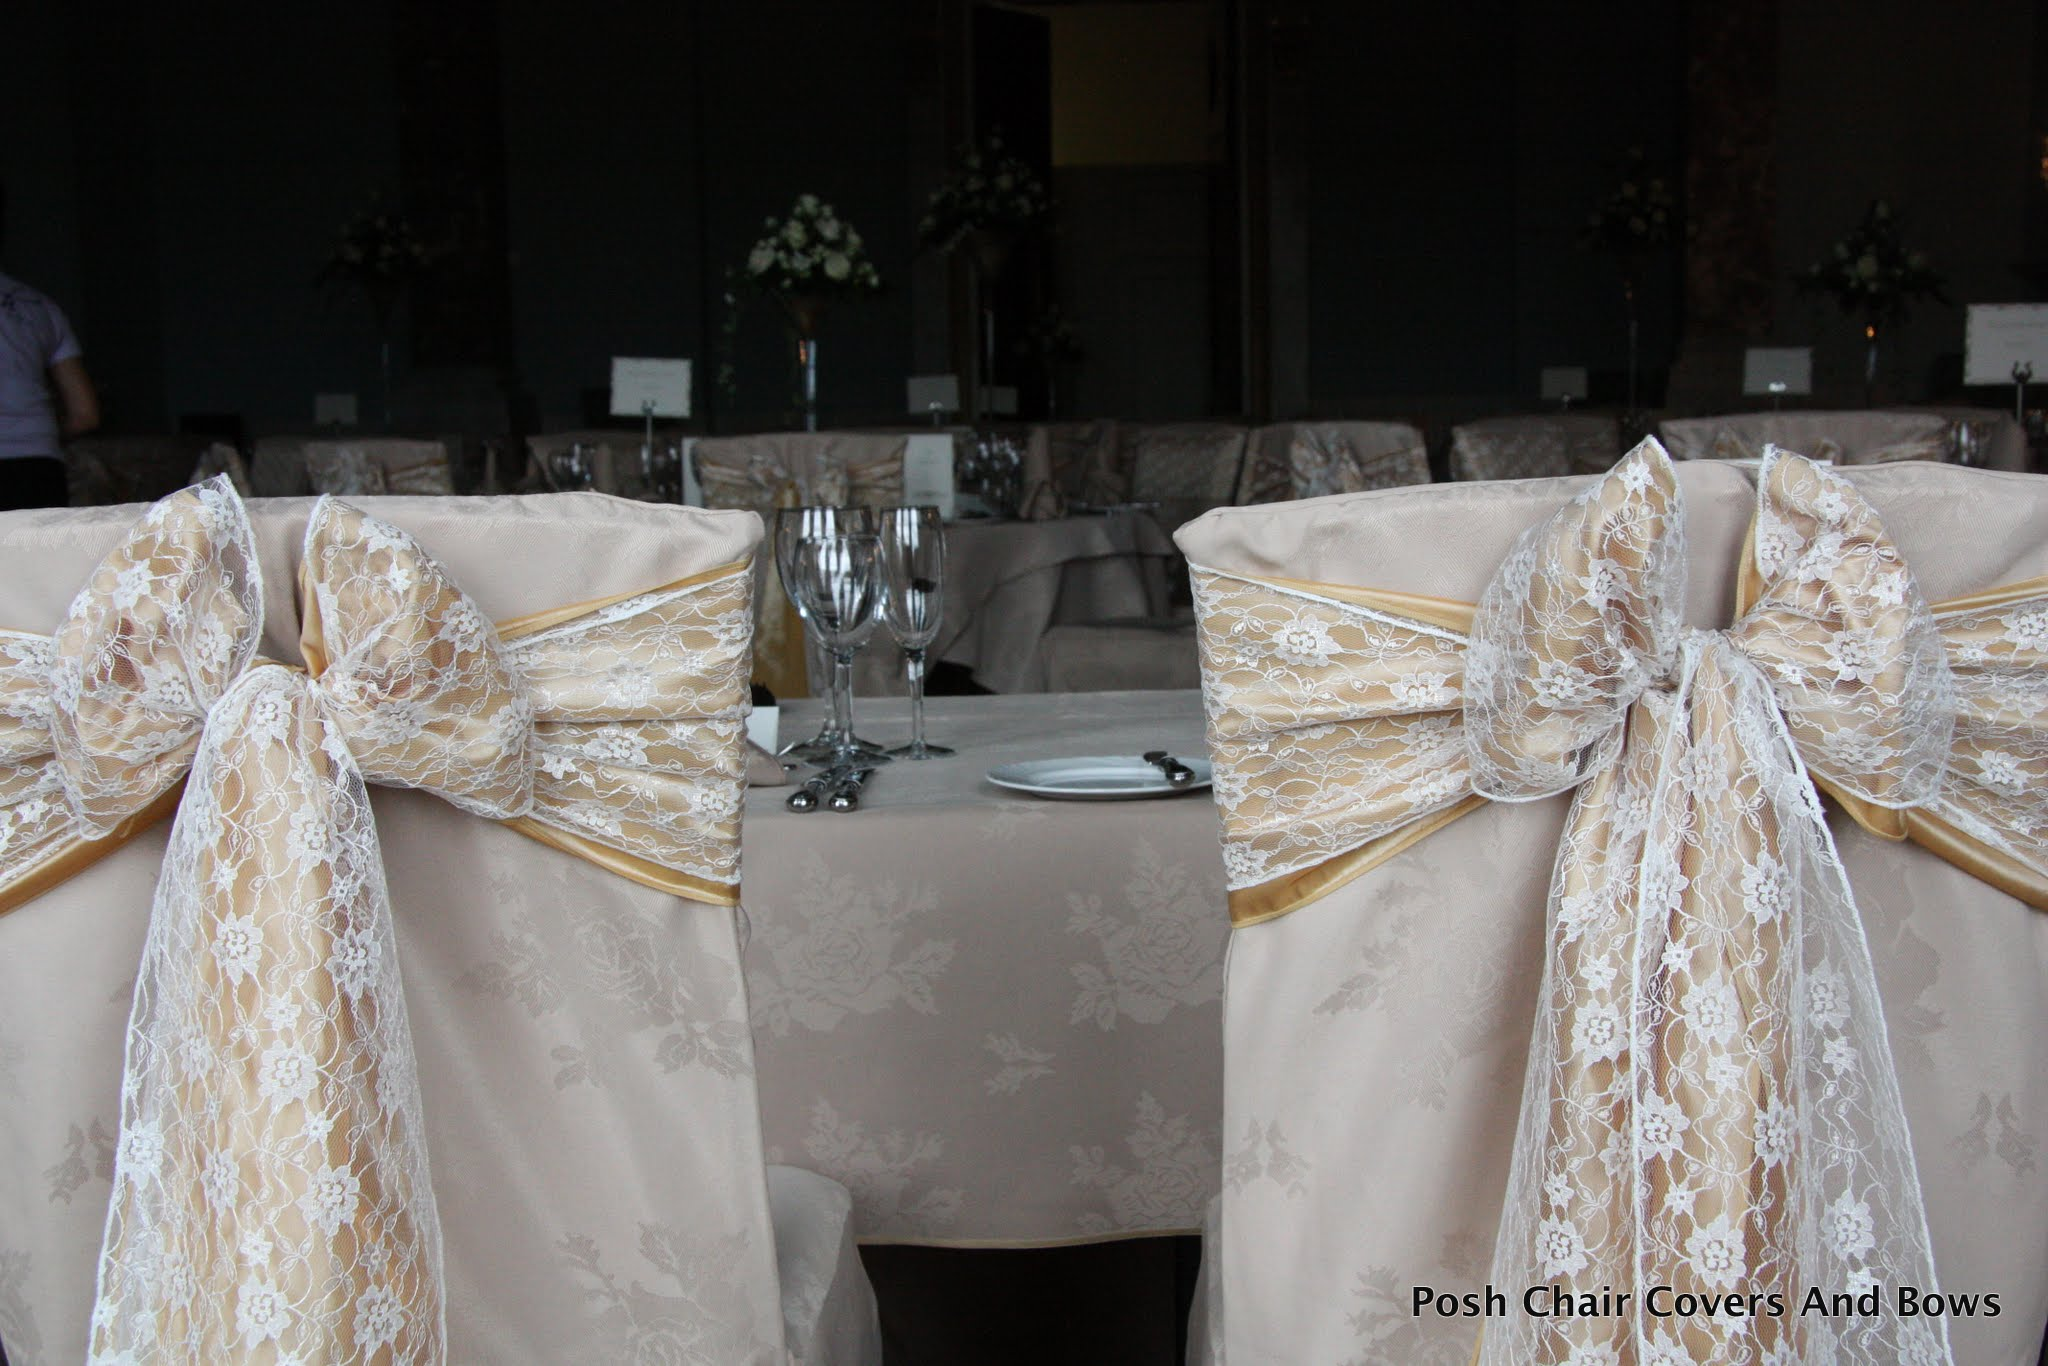 Posh Chair Covers & Bows Chiavari Chairs Flower Wall